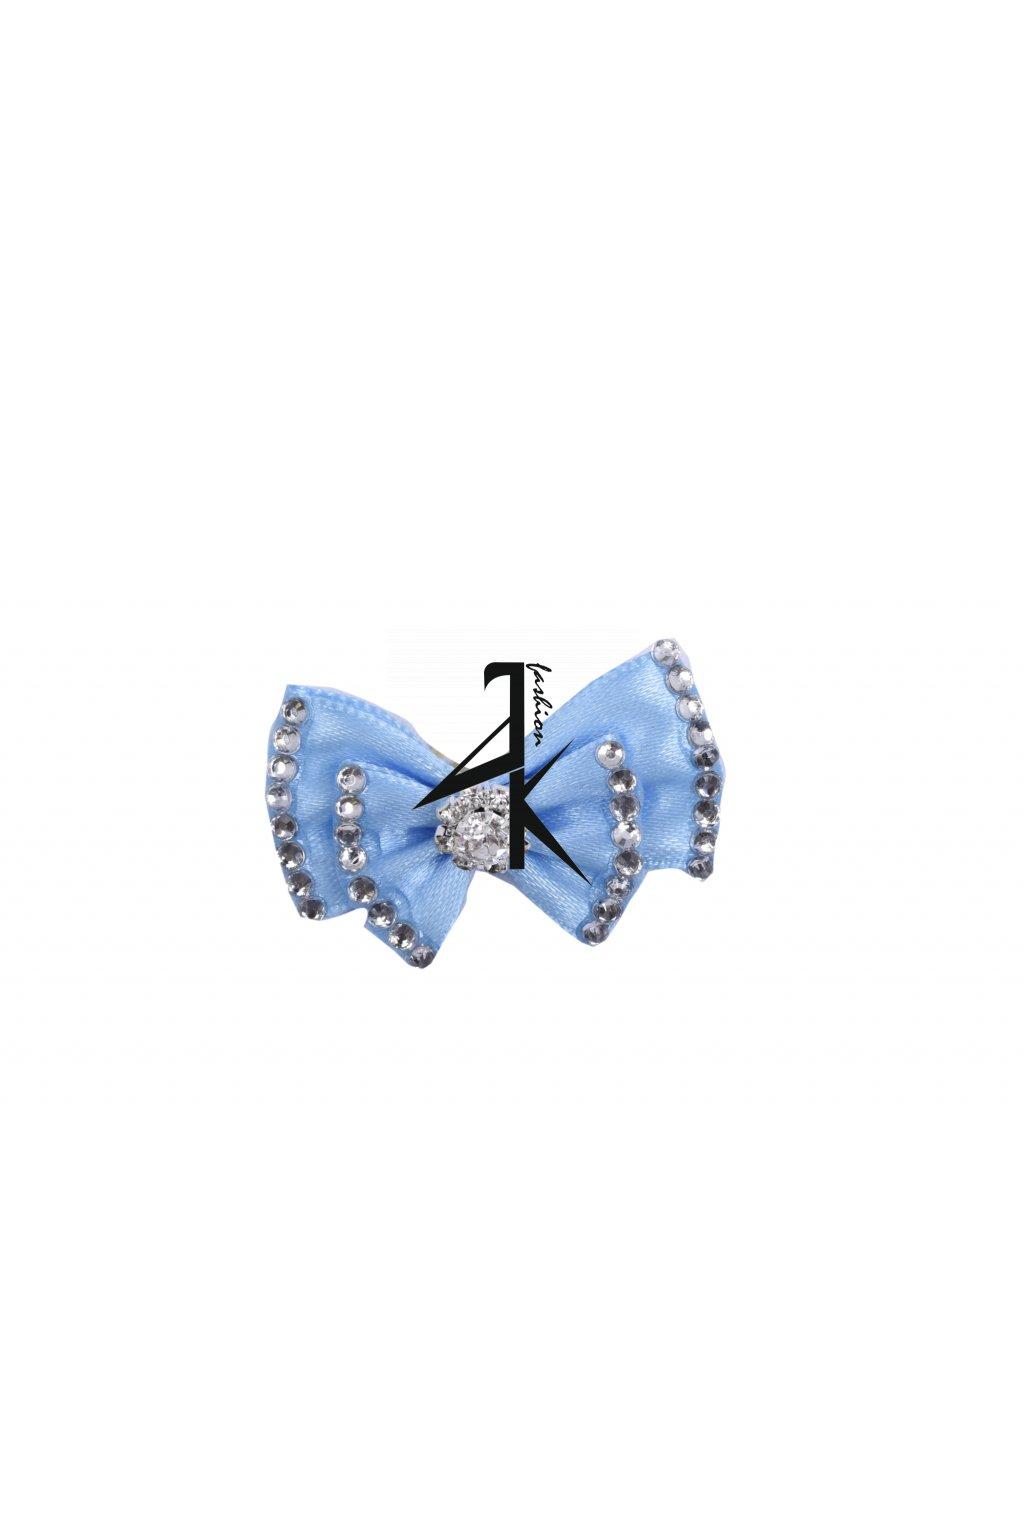 sponky do vlasu maslicka VV blue 11